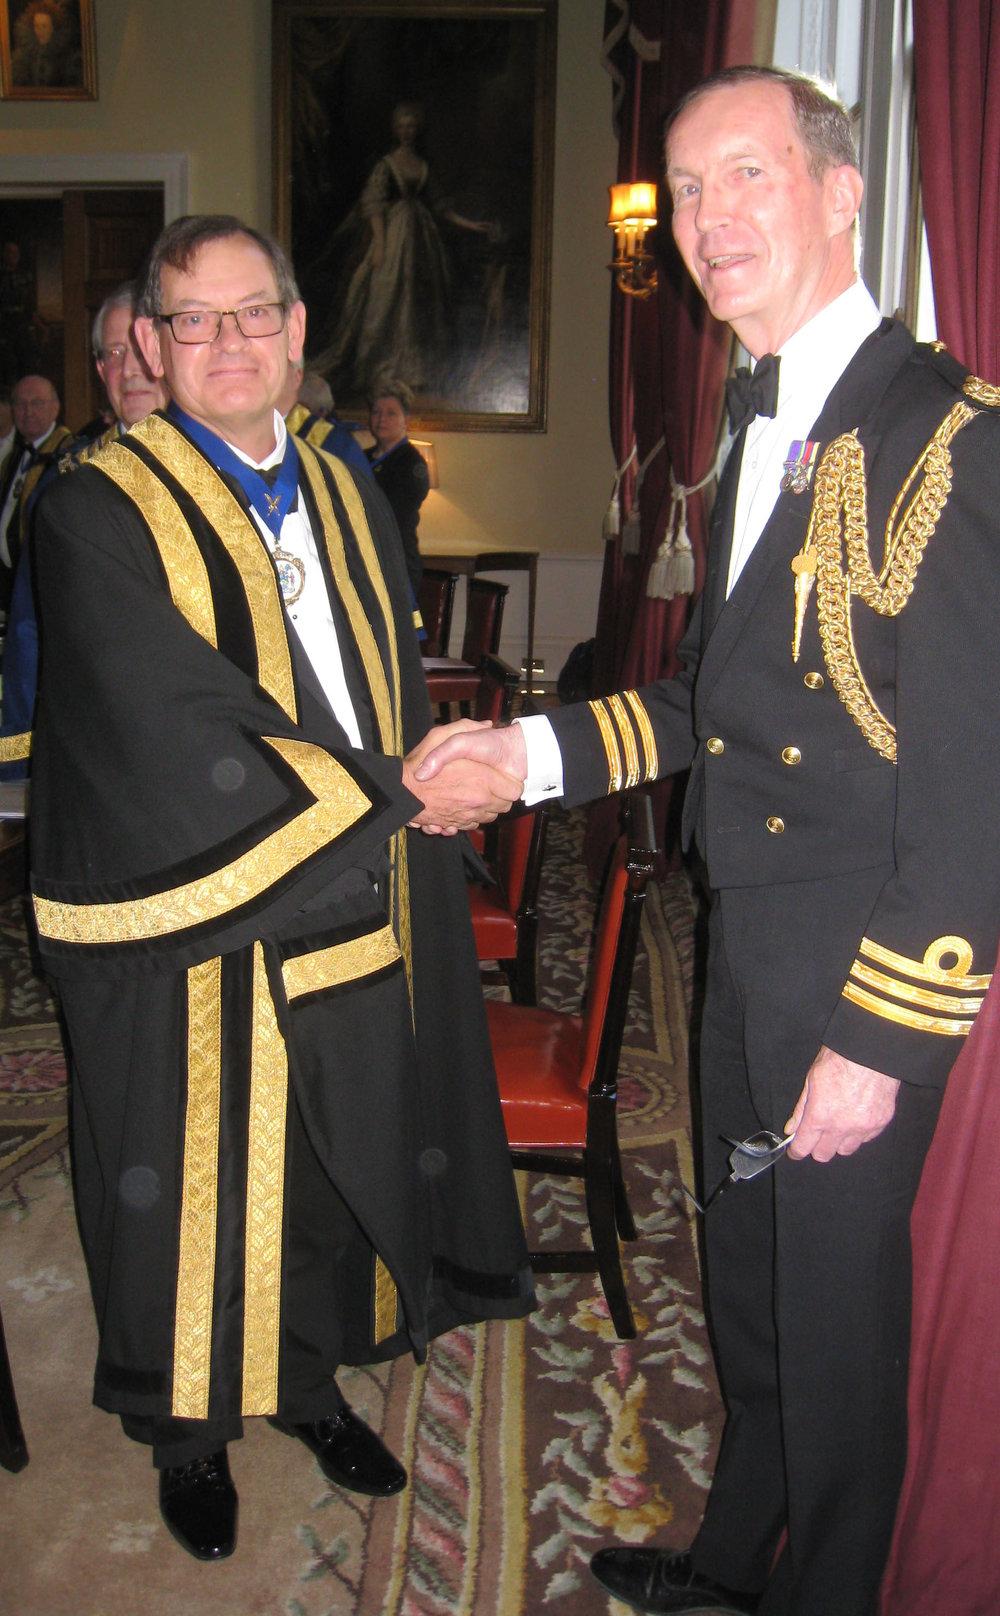 Clerk Cdr Mark Dickens RN & Retd Clerk Cdr Robin House RN Hon Liveryman